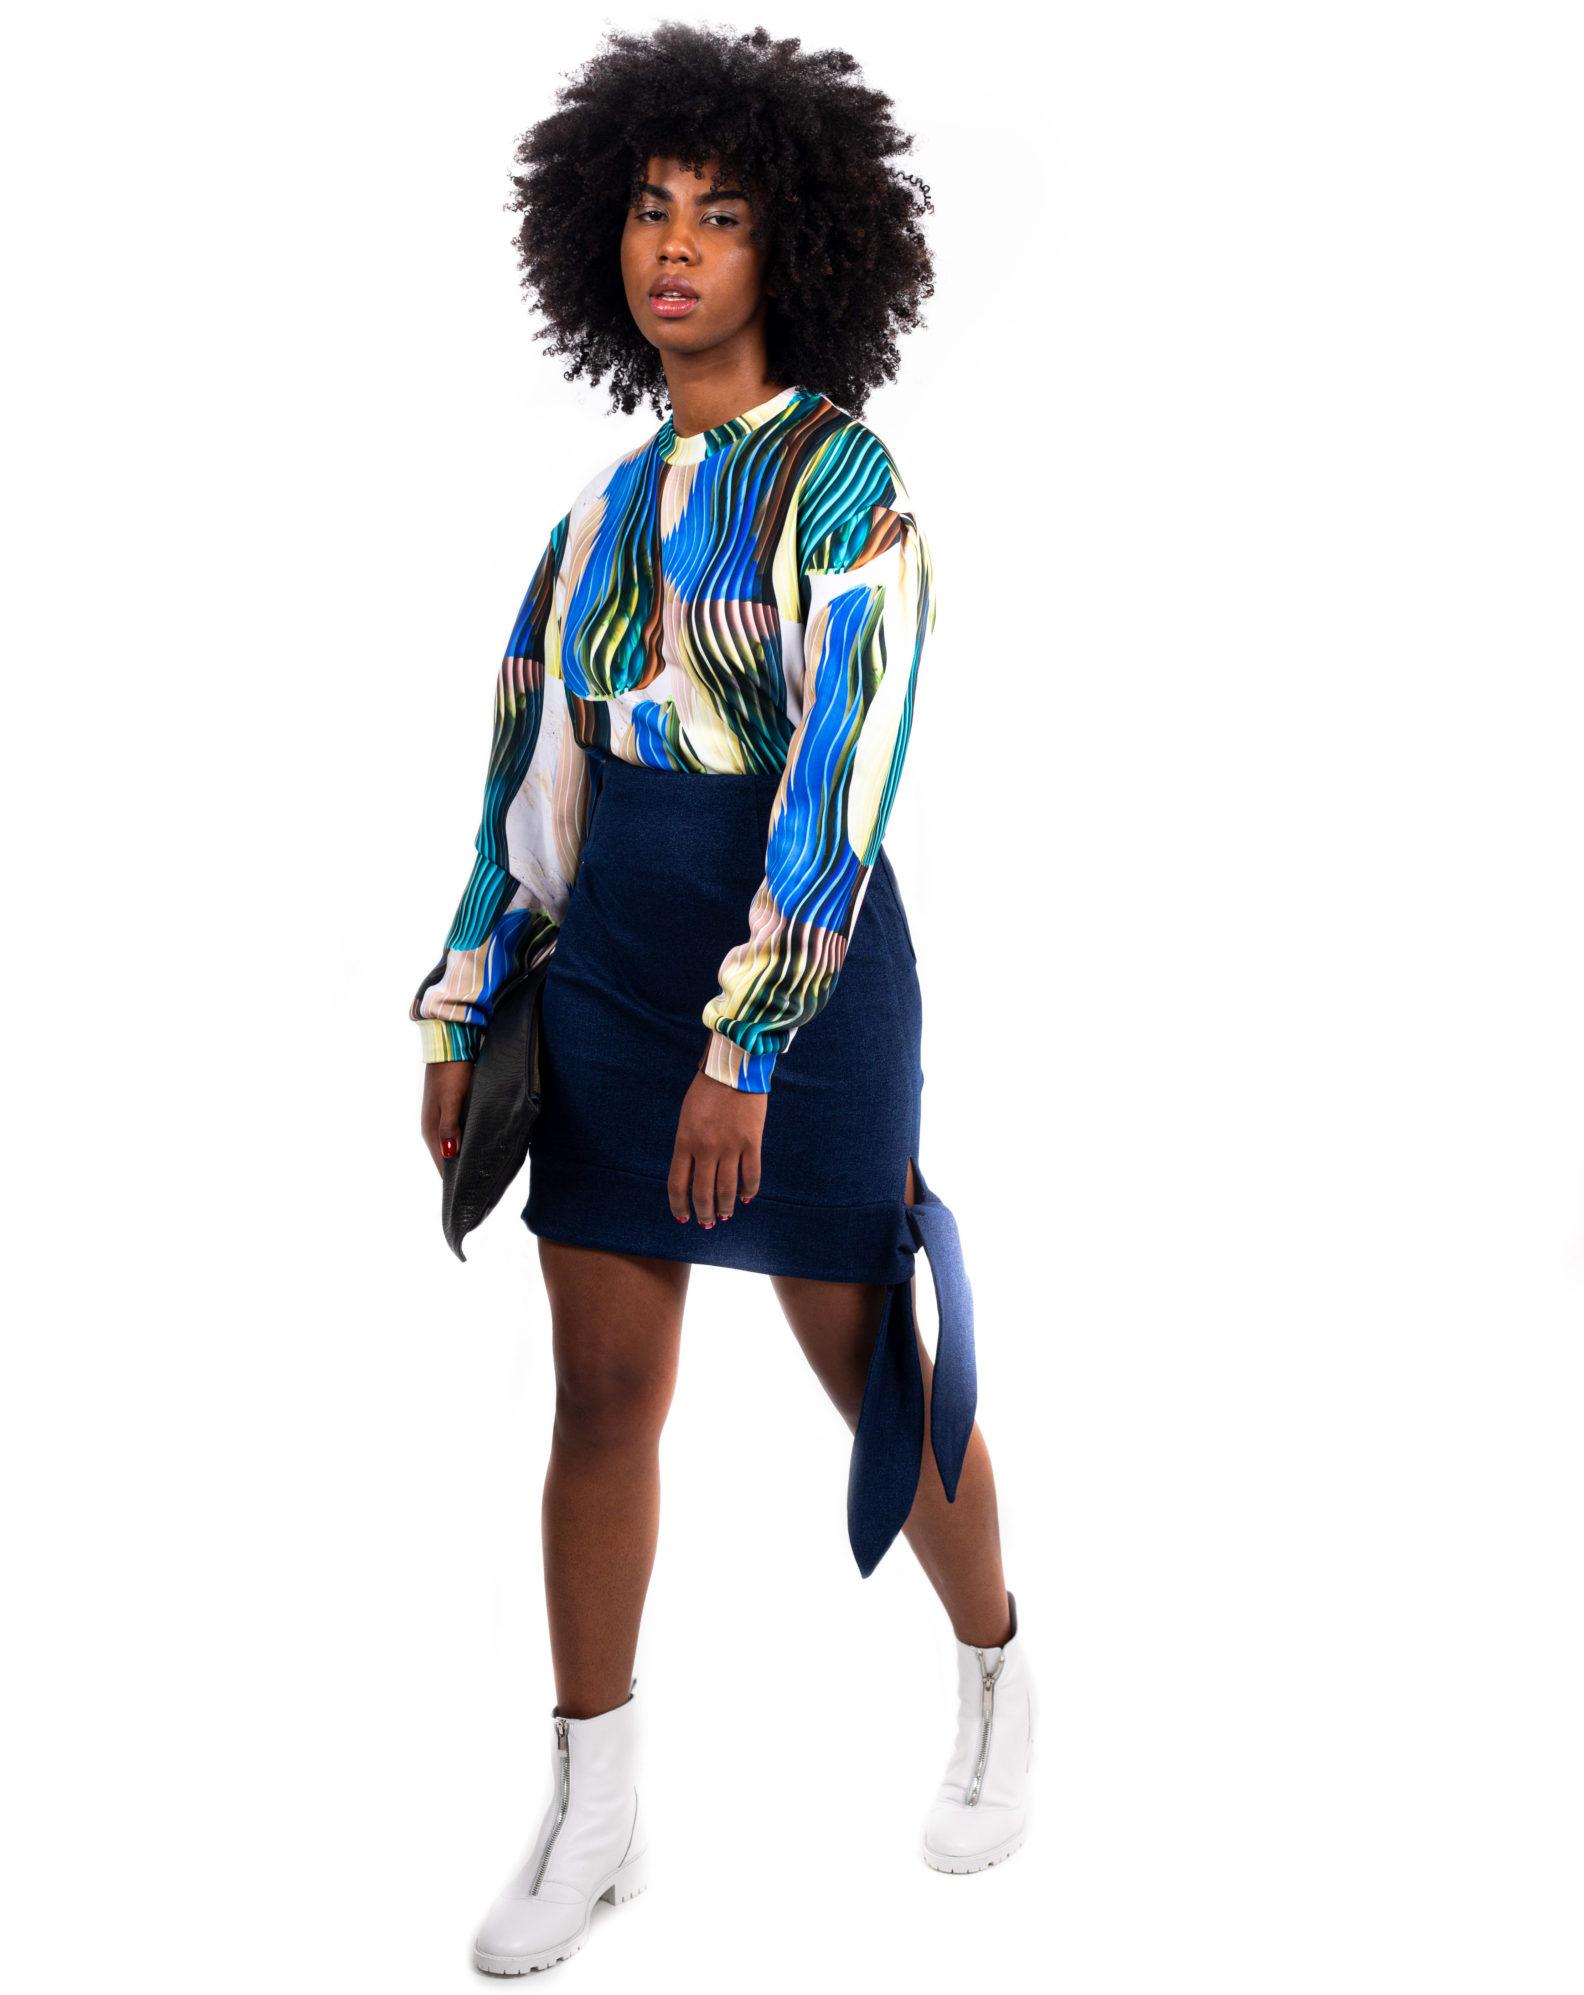 minbi-jupe-skirt-attaches-poches-plaquees-taille-haute-high-waist-vleeda-affaires-etrangeres